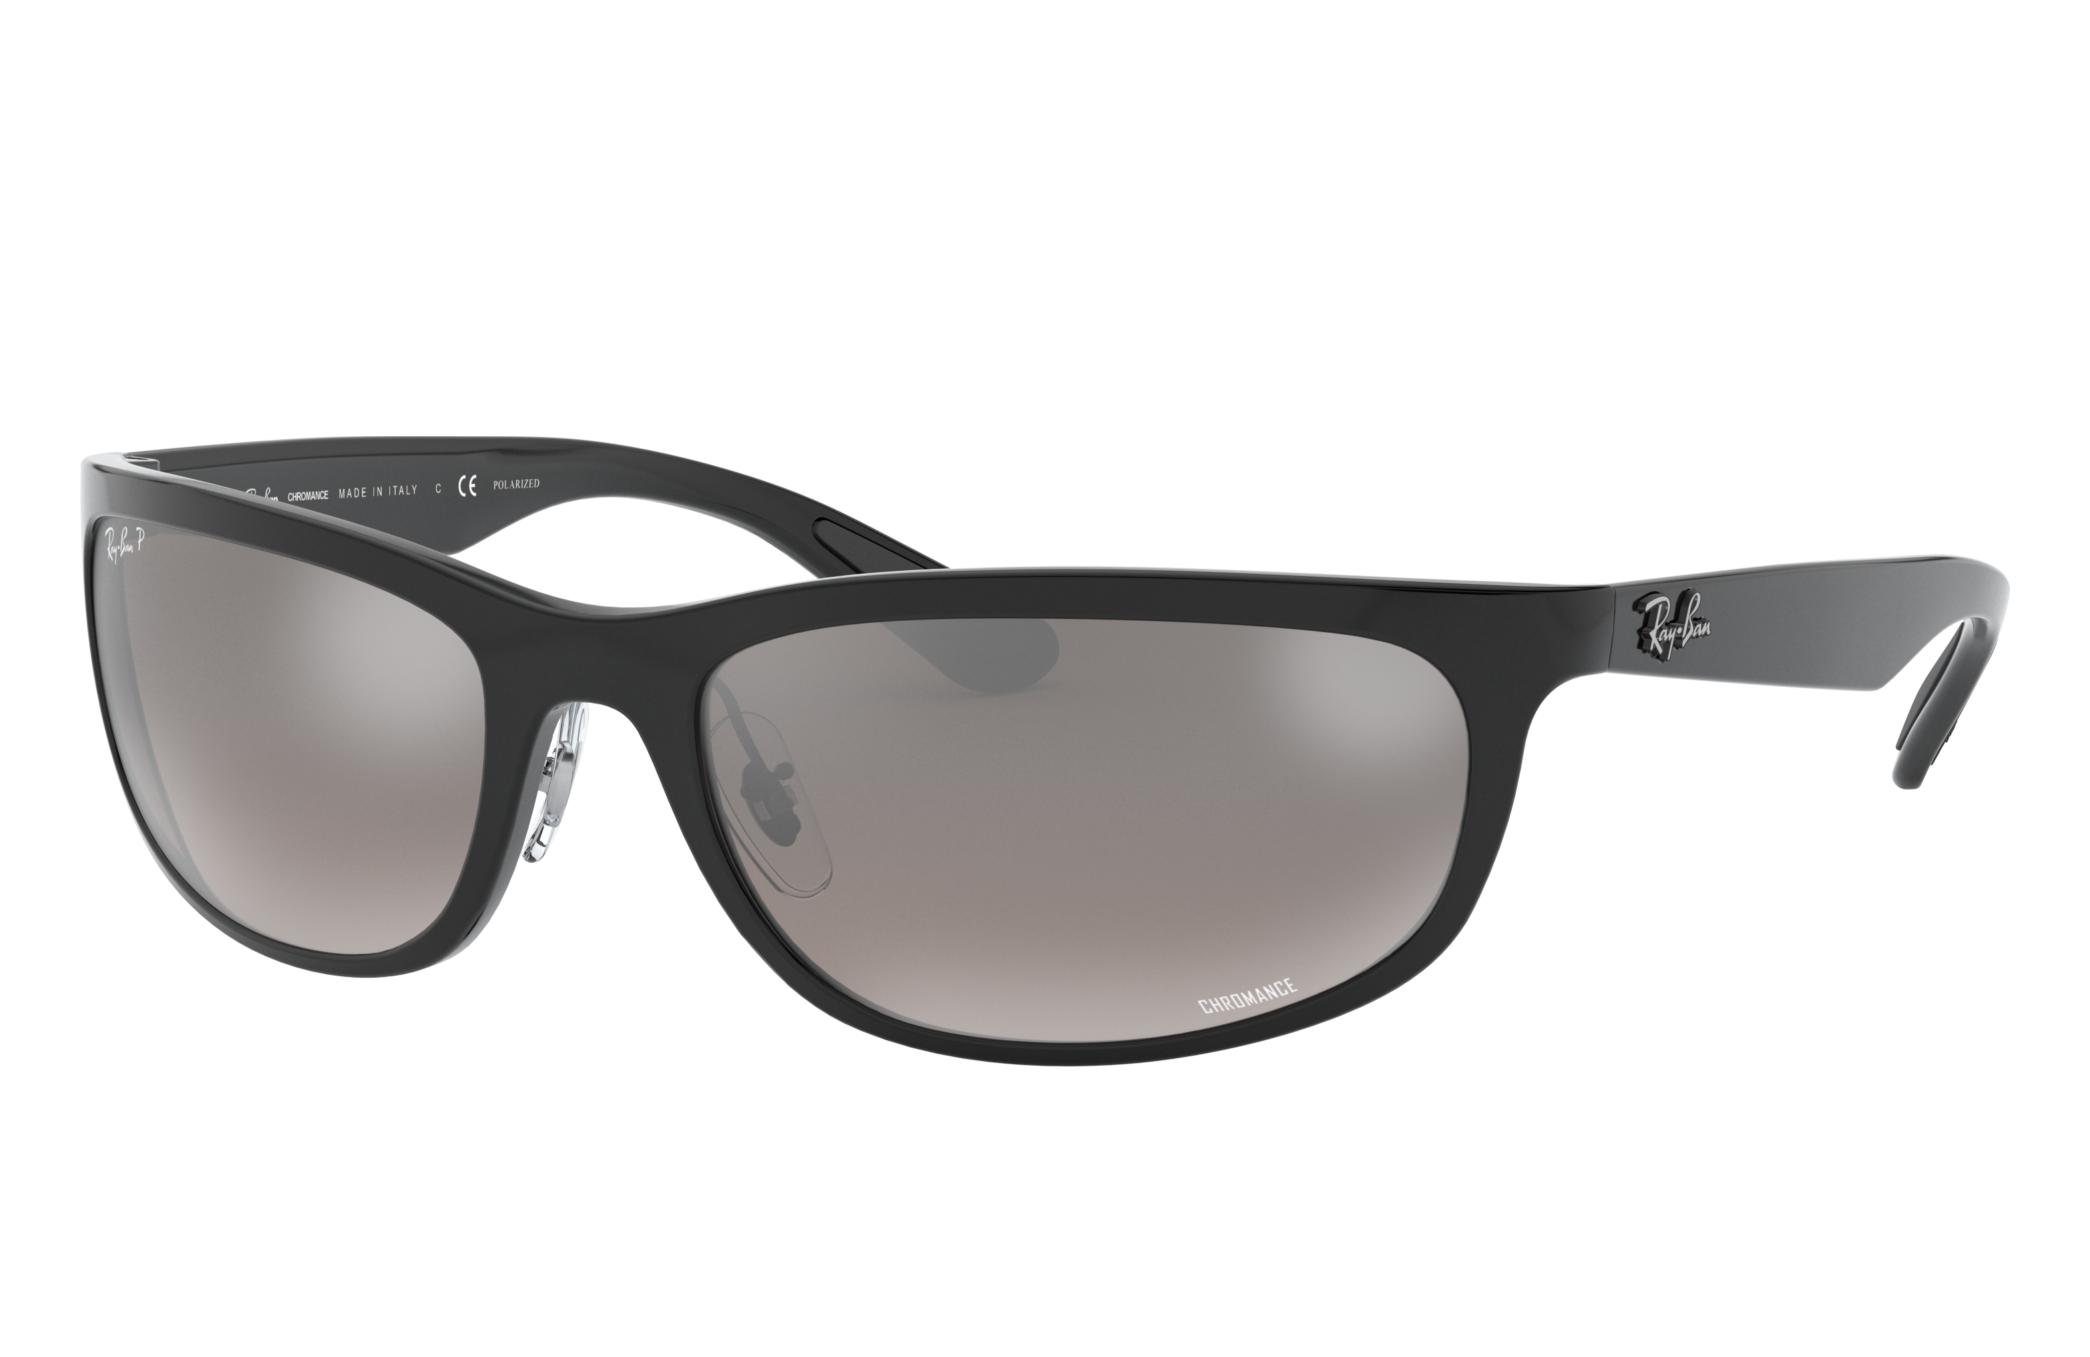 Ray-Ban Rb4265 Chromance Black, Polarized Gray Lenses - RB4265